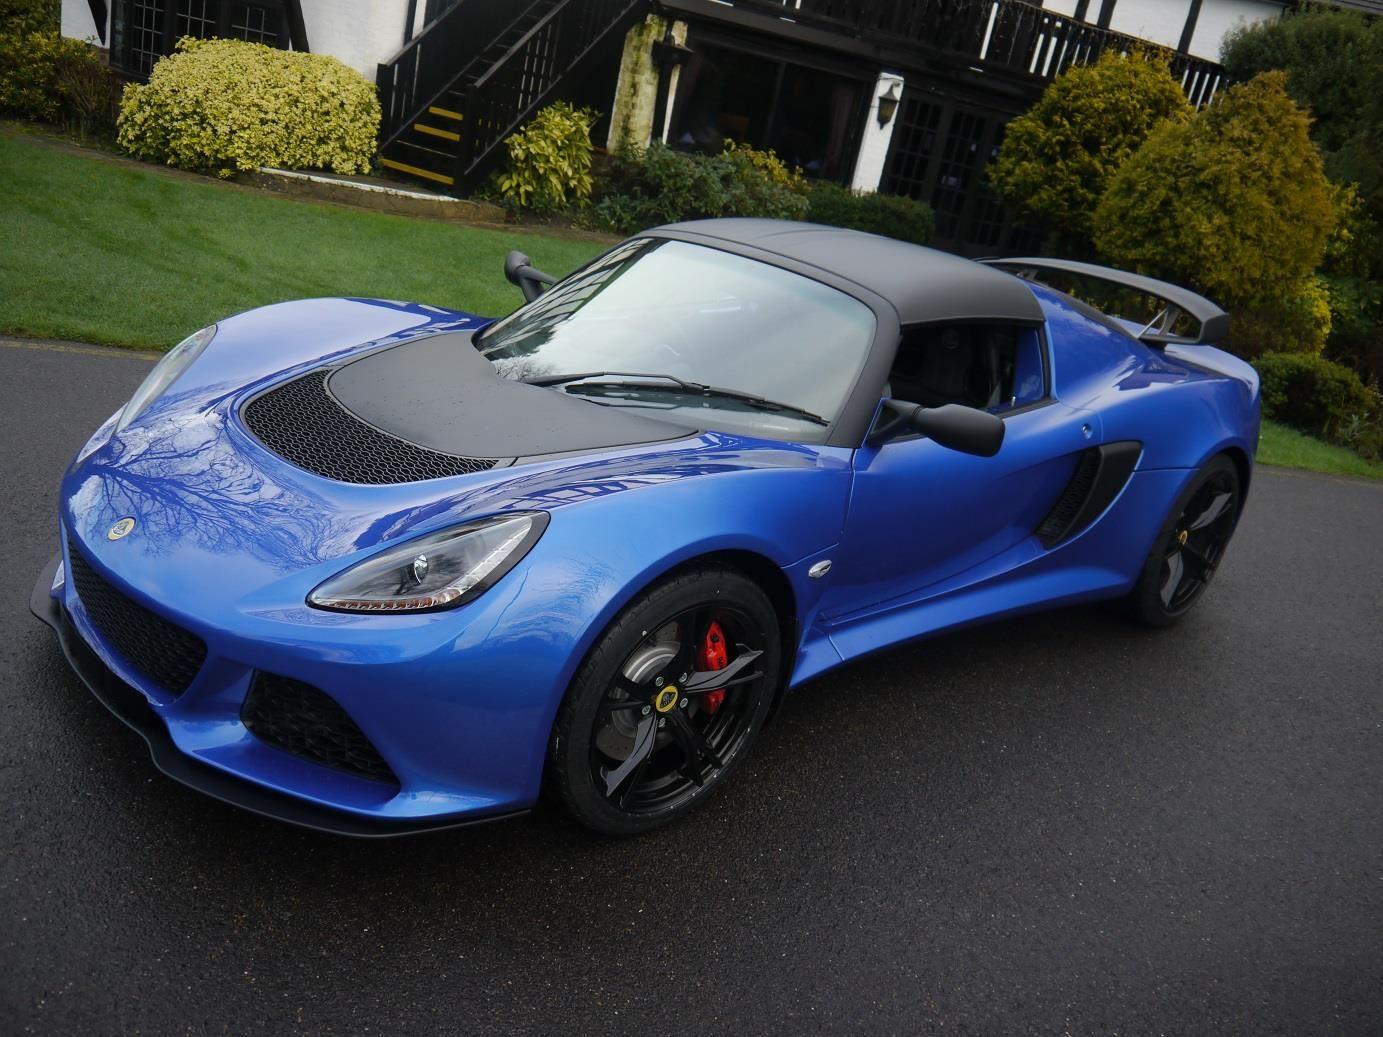 Used 2015 Lotus Exige S3 for sale in Surrey Pistonheads